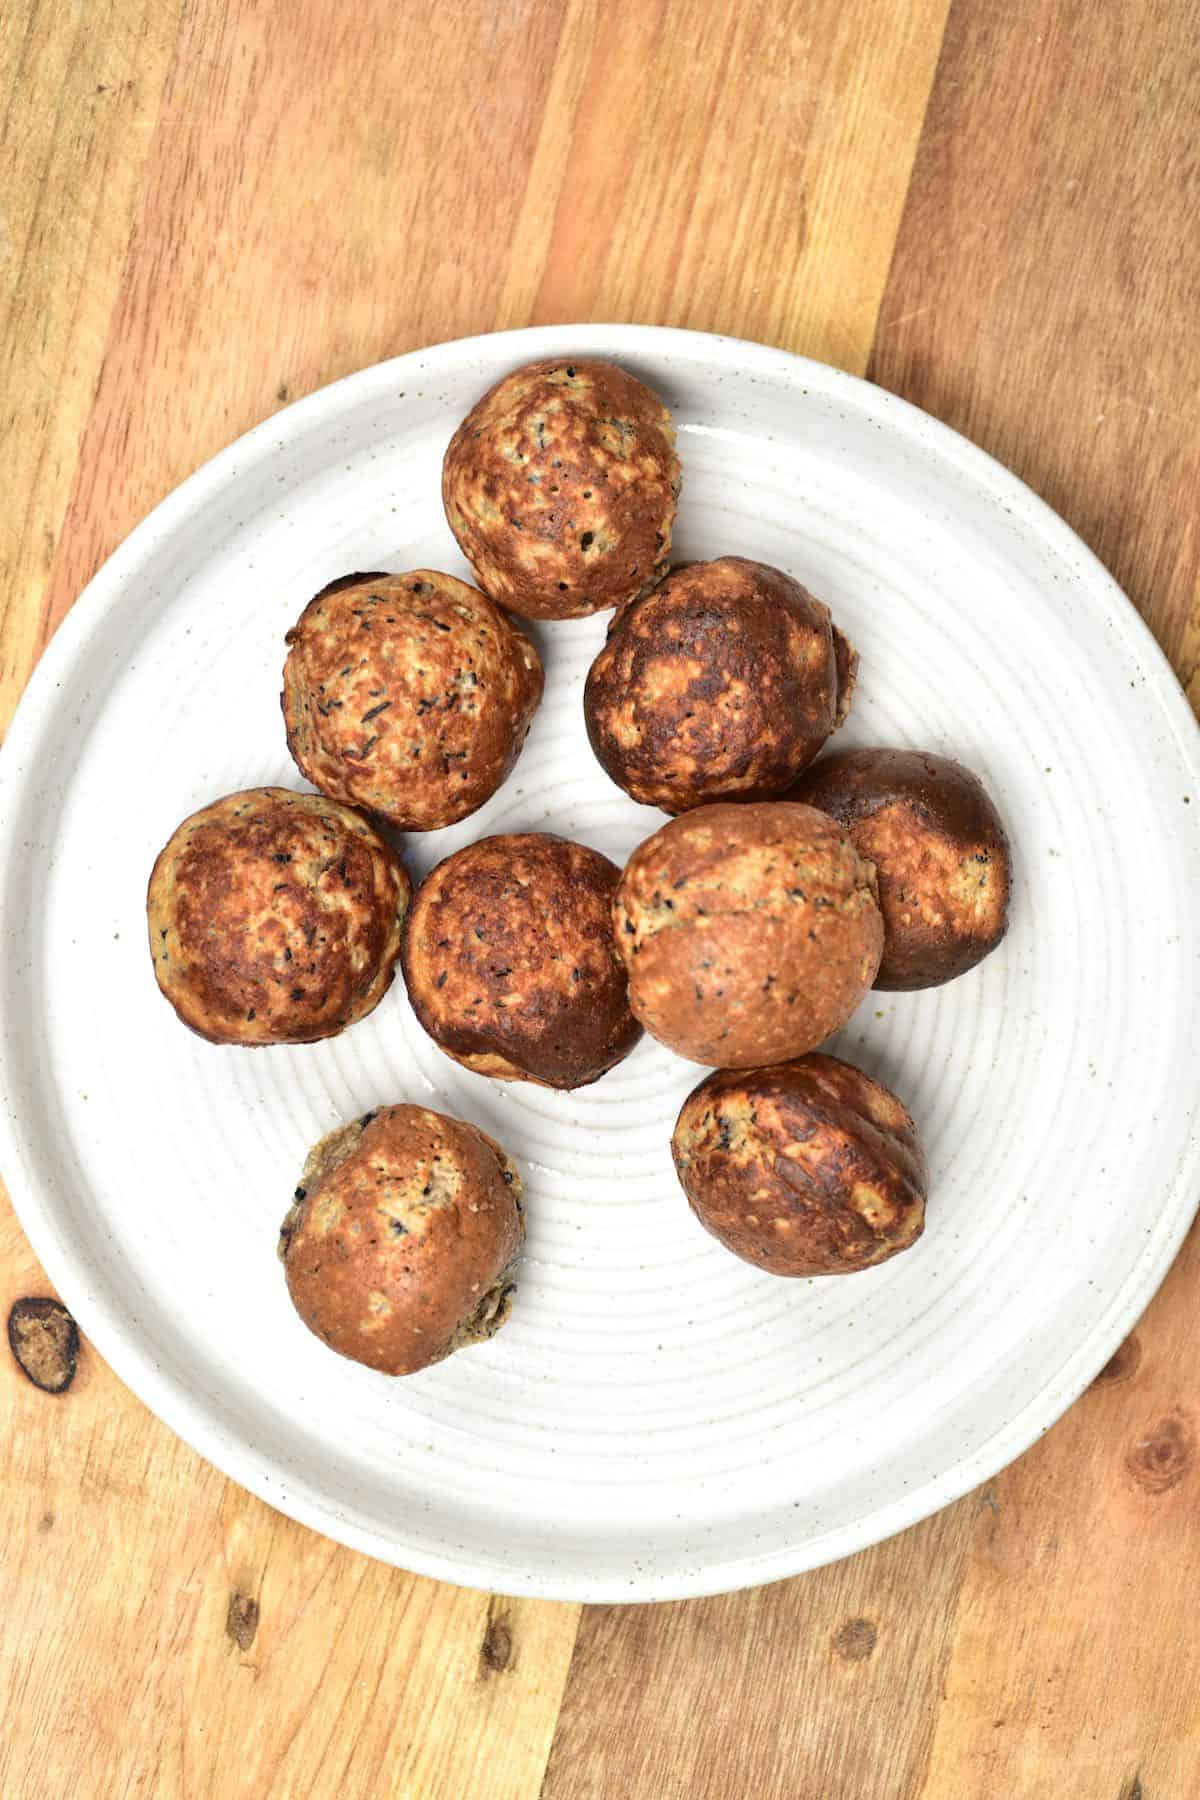 Mini pancake balls served in a plate